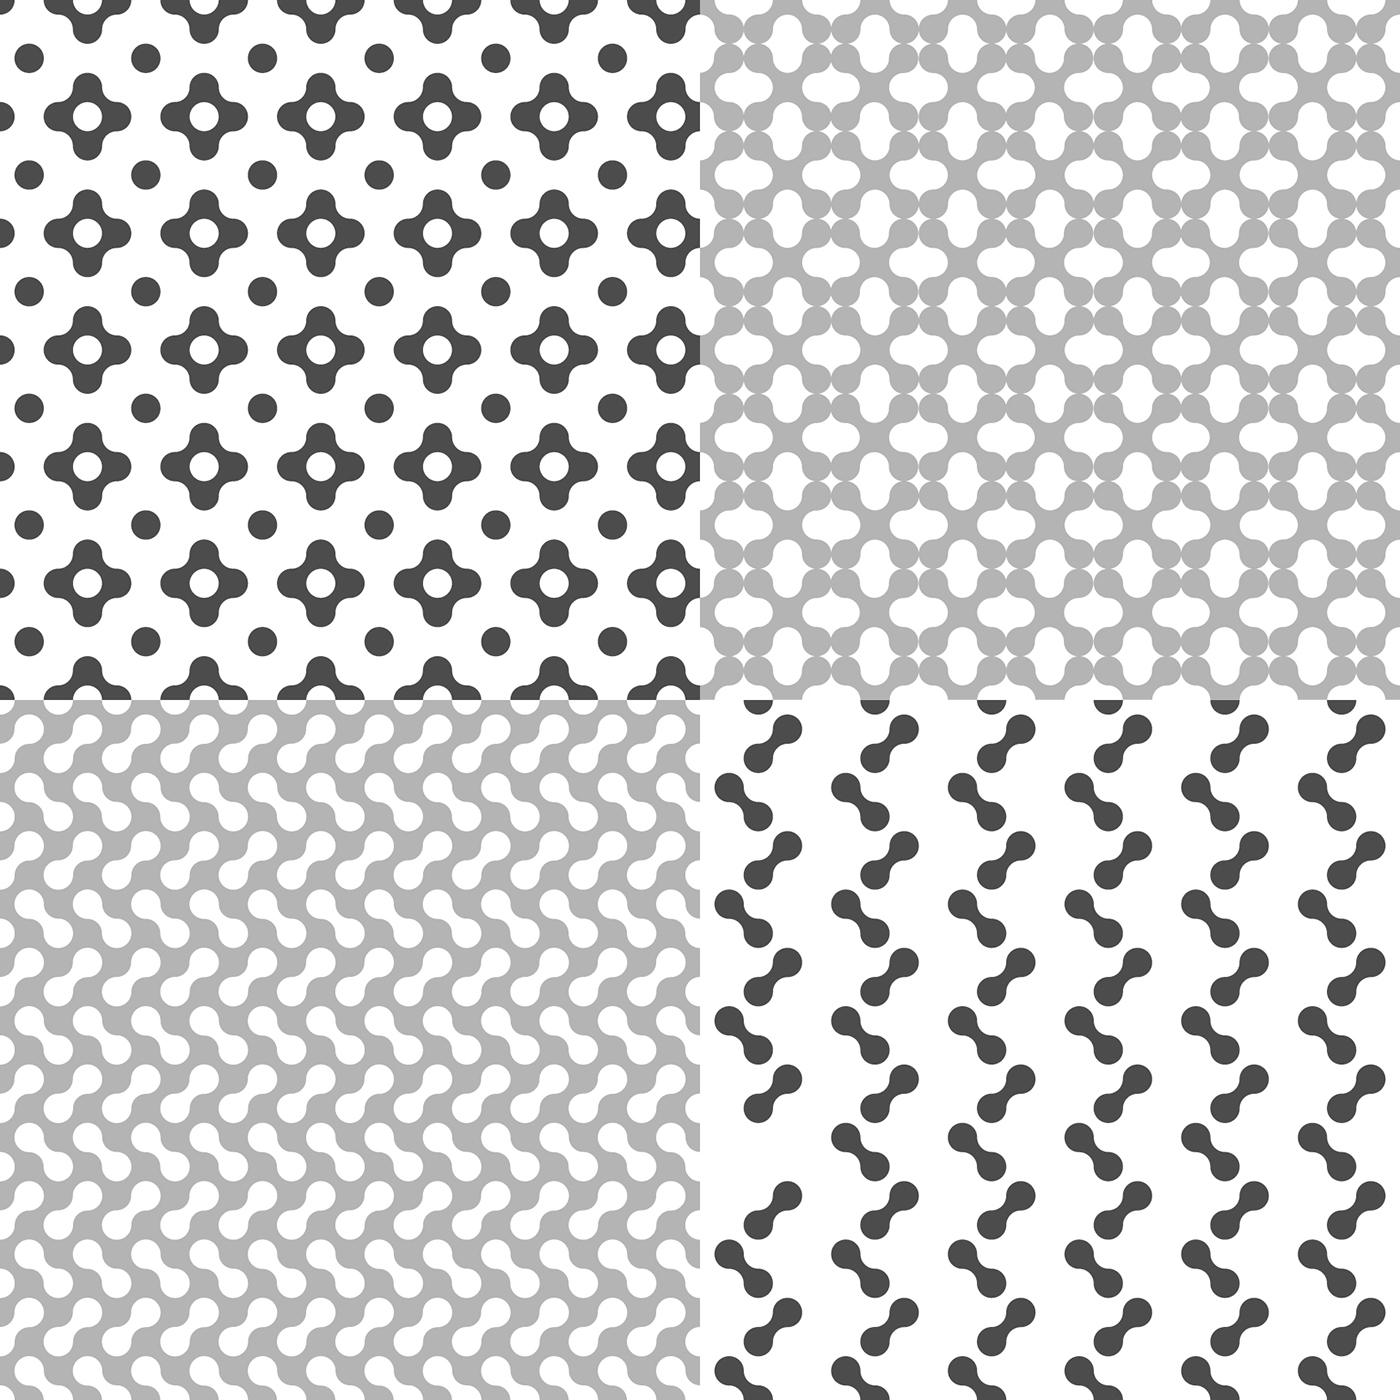 Drops Patterns Simple Ideas